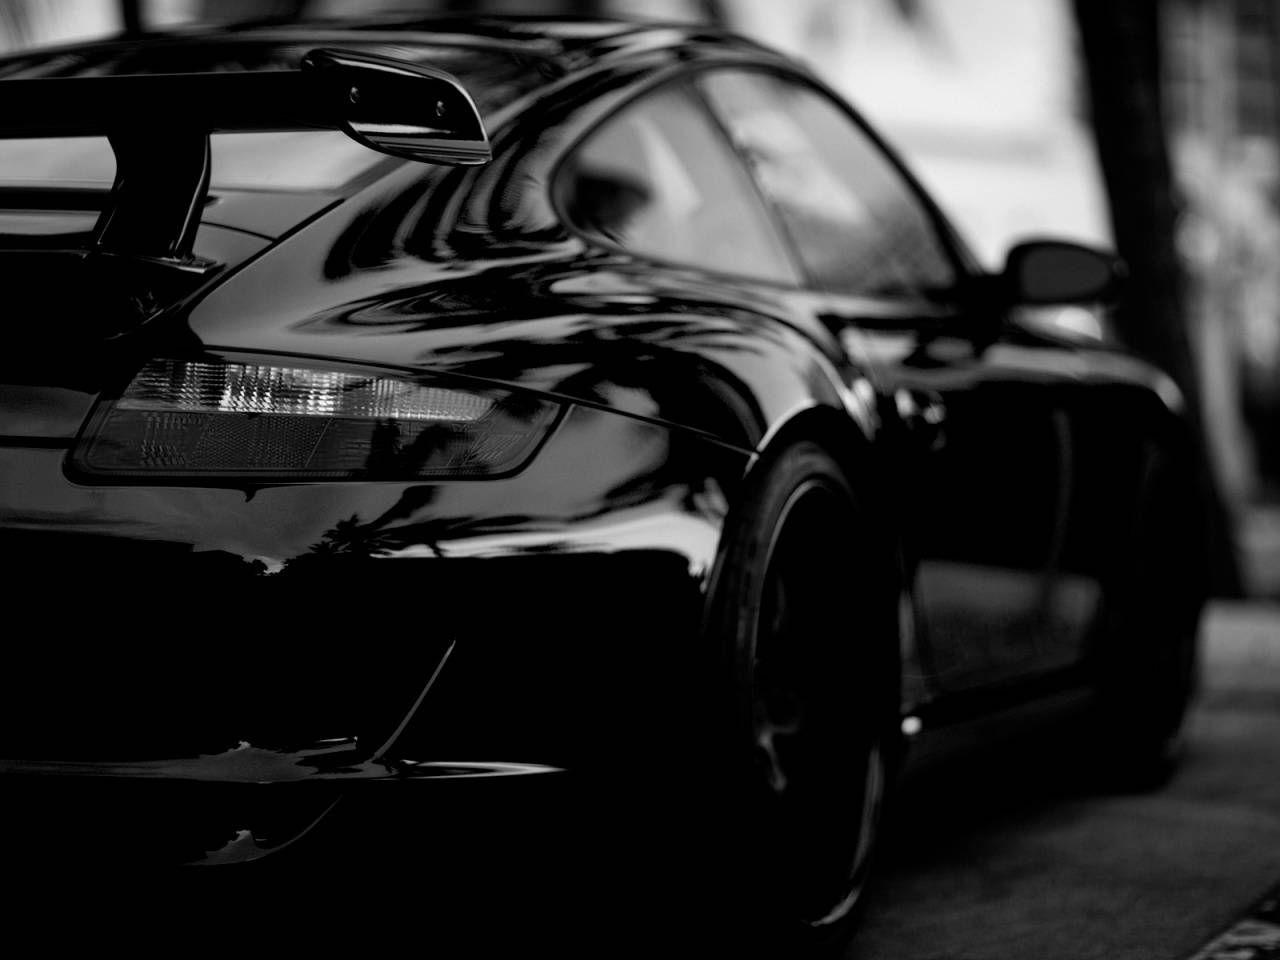 2013 Porsche Black Tuned Wallpaper Porsche Iphone Wallpaper Matte Black Cars Wallpaper Images Hd